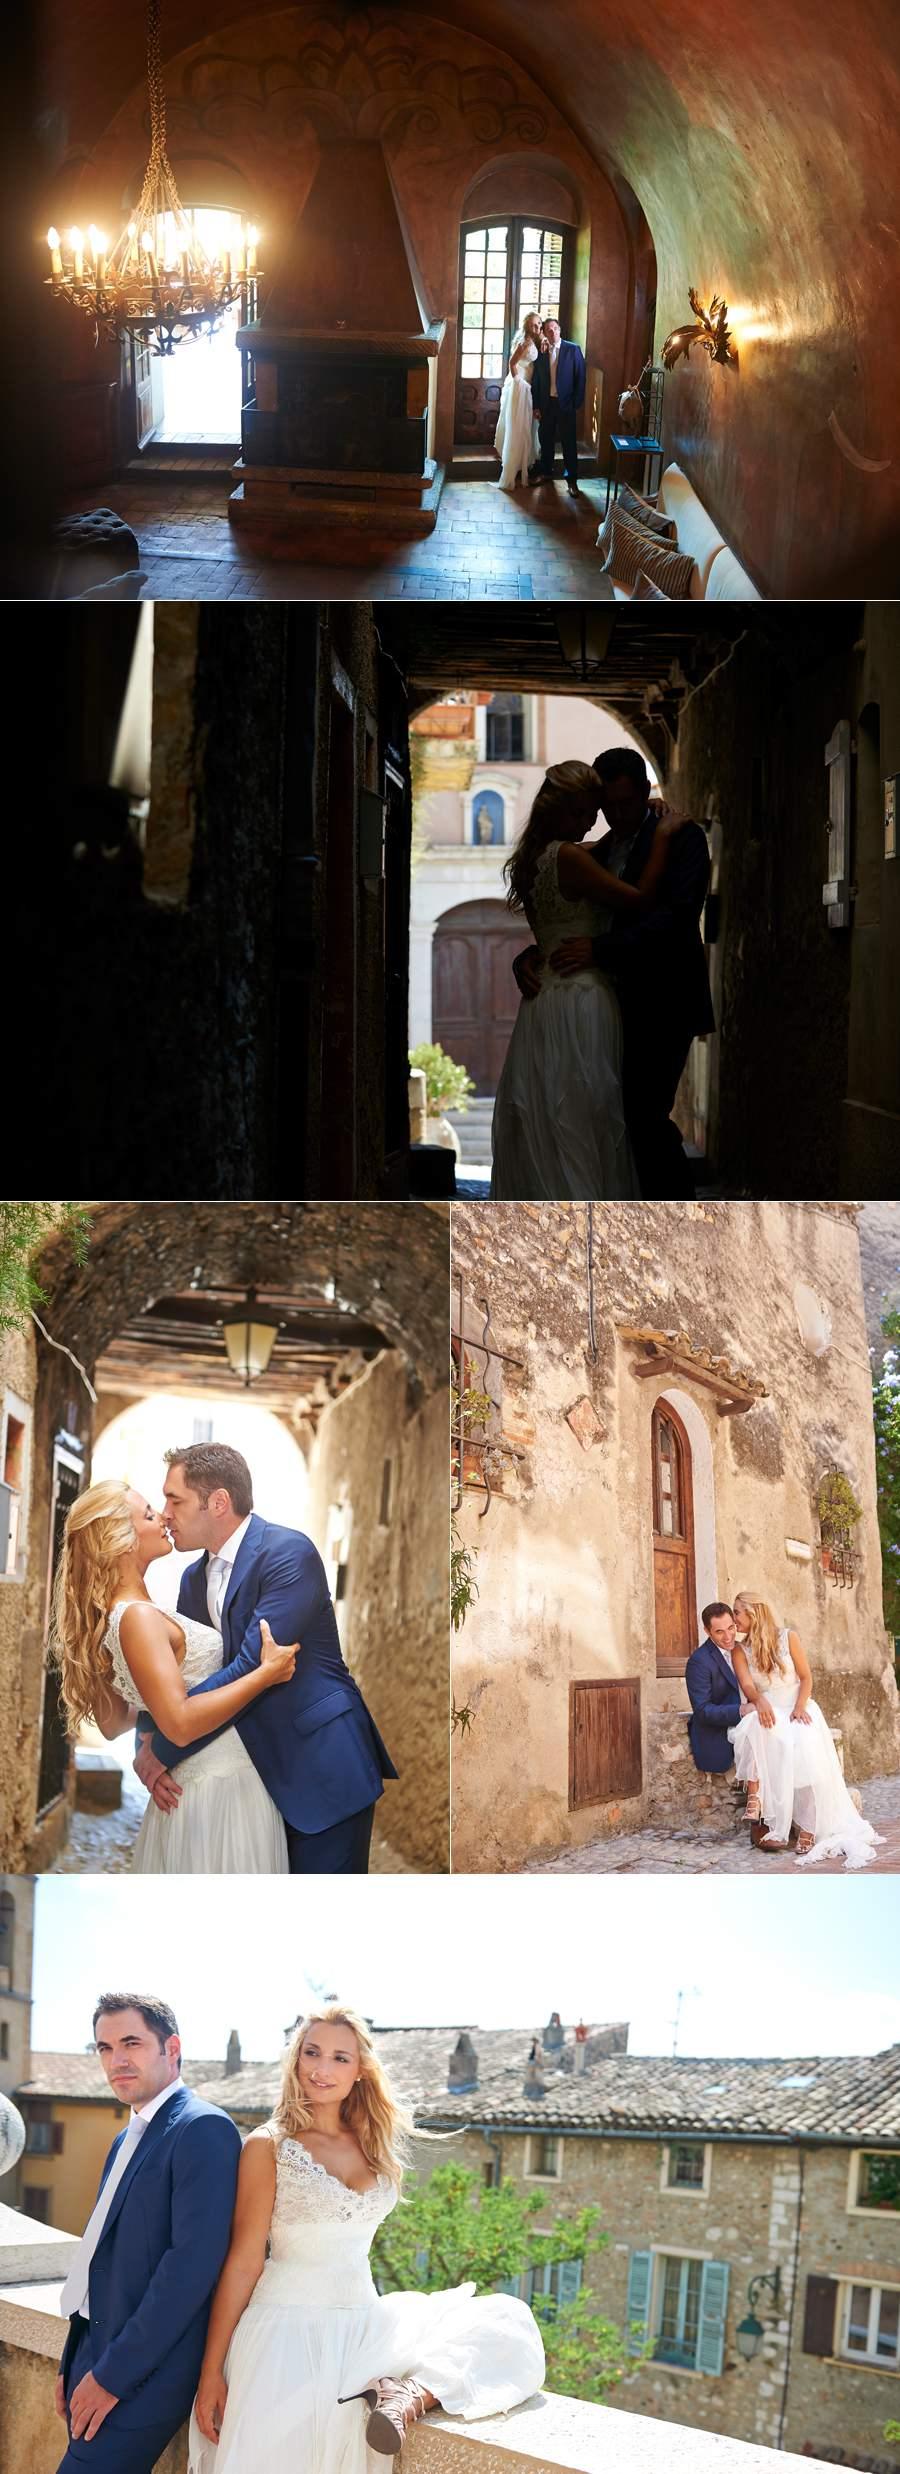 Stavros Efi wedding photos01